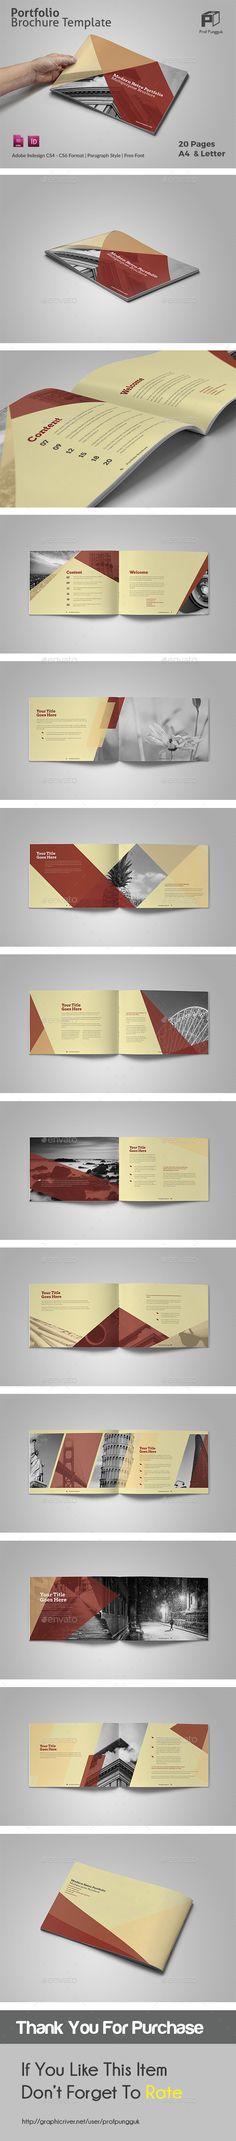 Mountcool - Creative One Page Multipurpose Template - retro brochure template